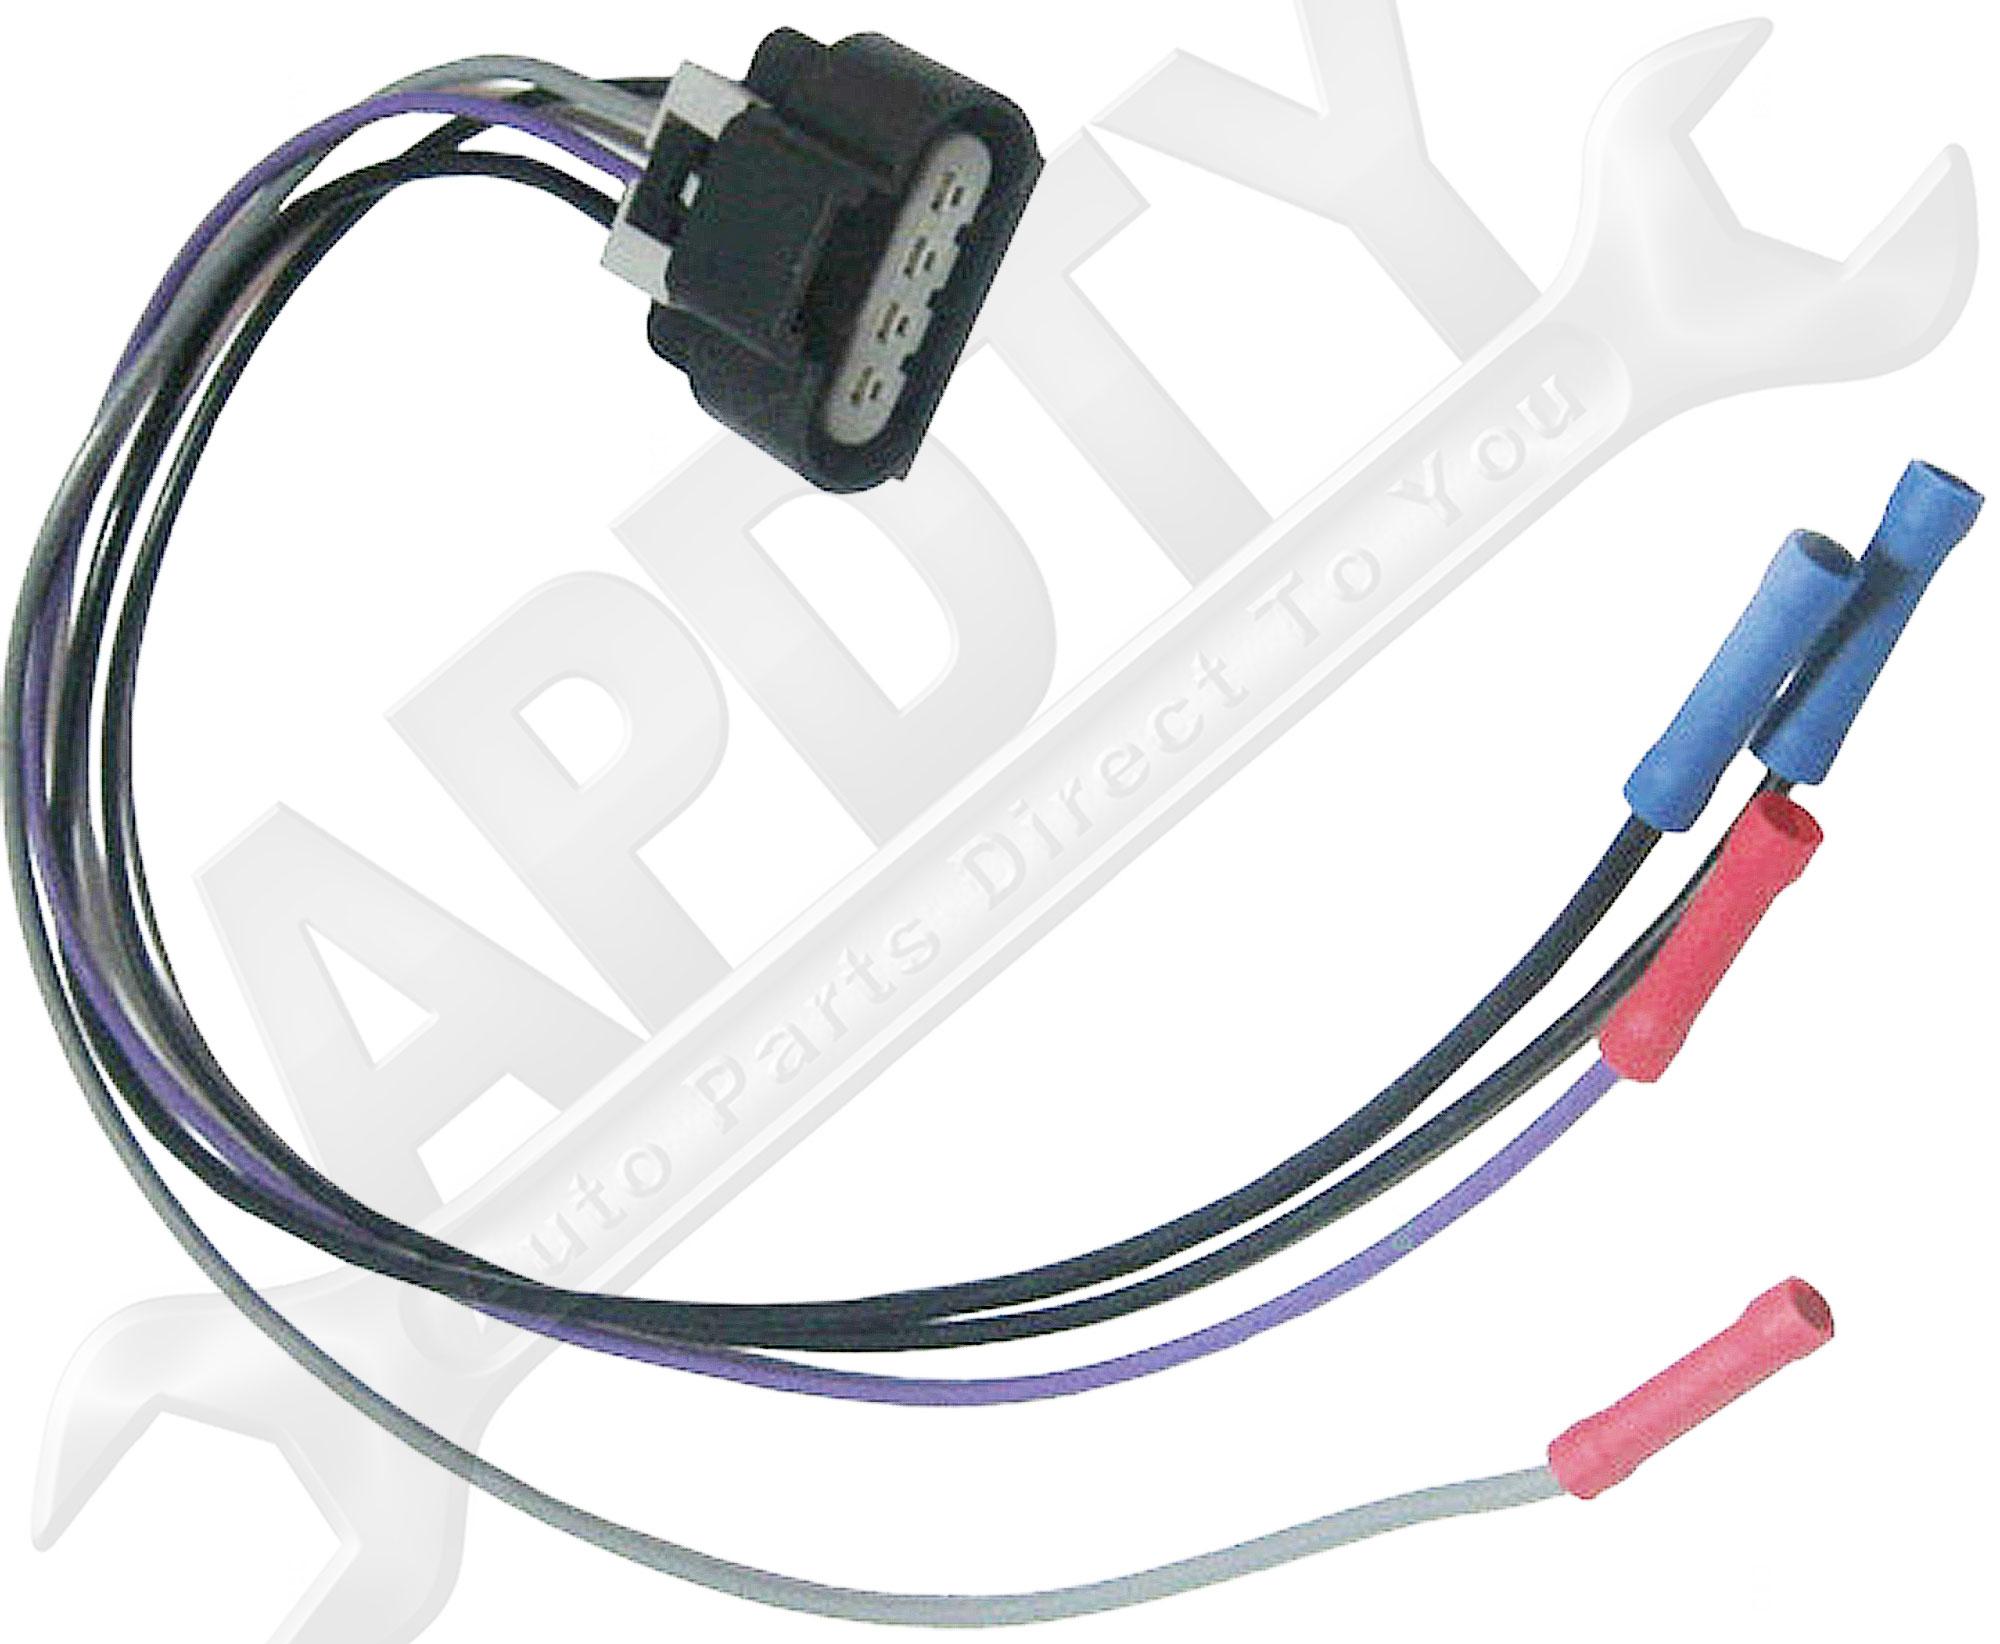 Fuel Pump Wiring Harness Connectors : Apdty fuel pump wiring harness with pin flat oval